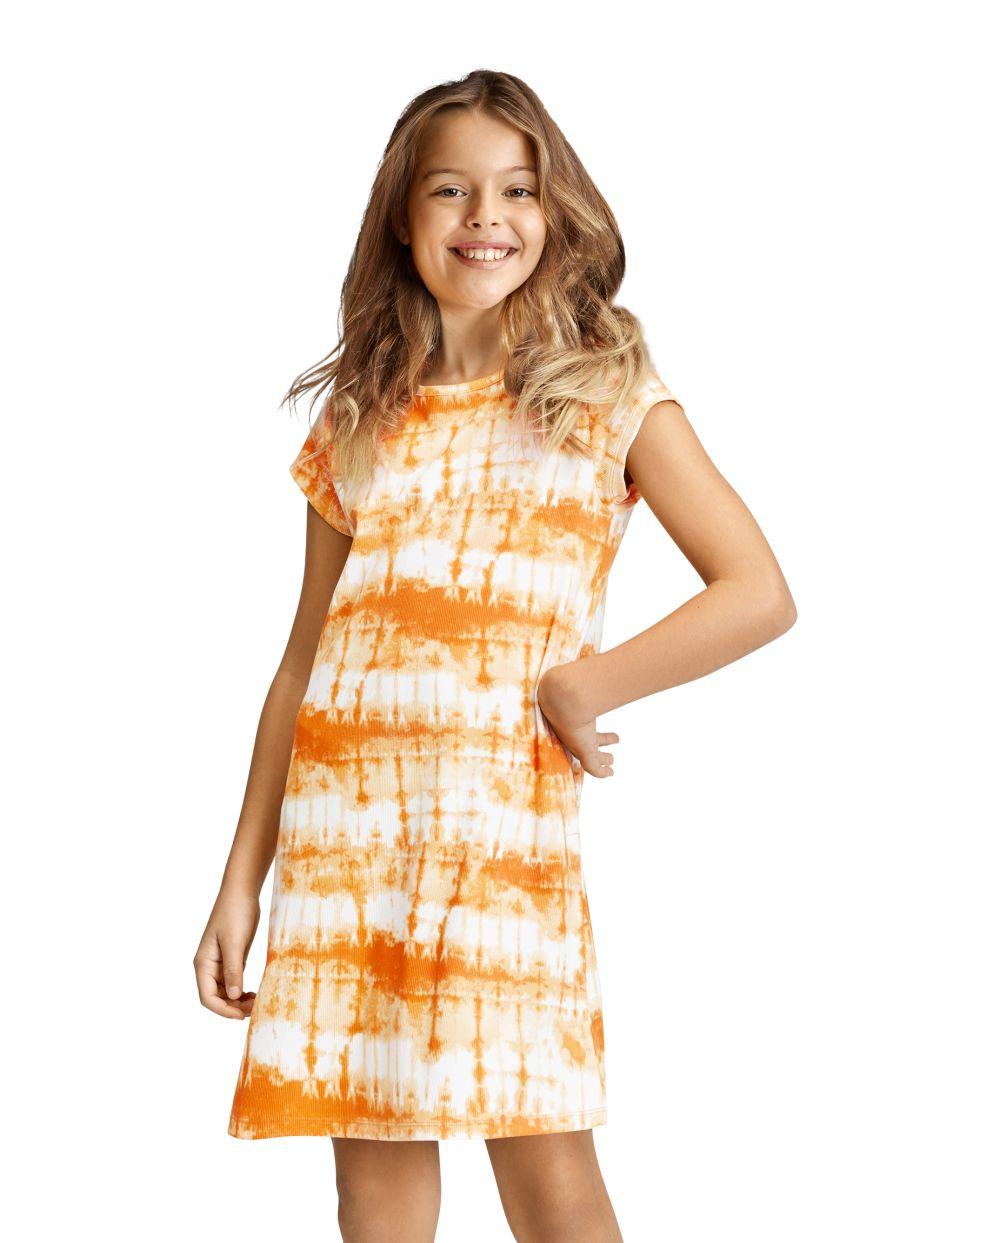 Girls Tie Dye T Shirt Dress - Orange